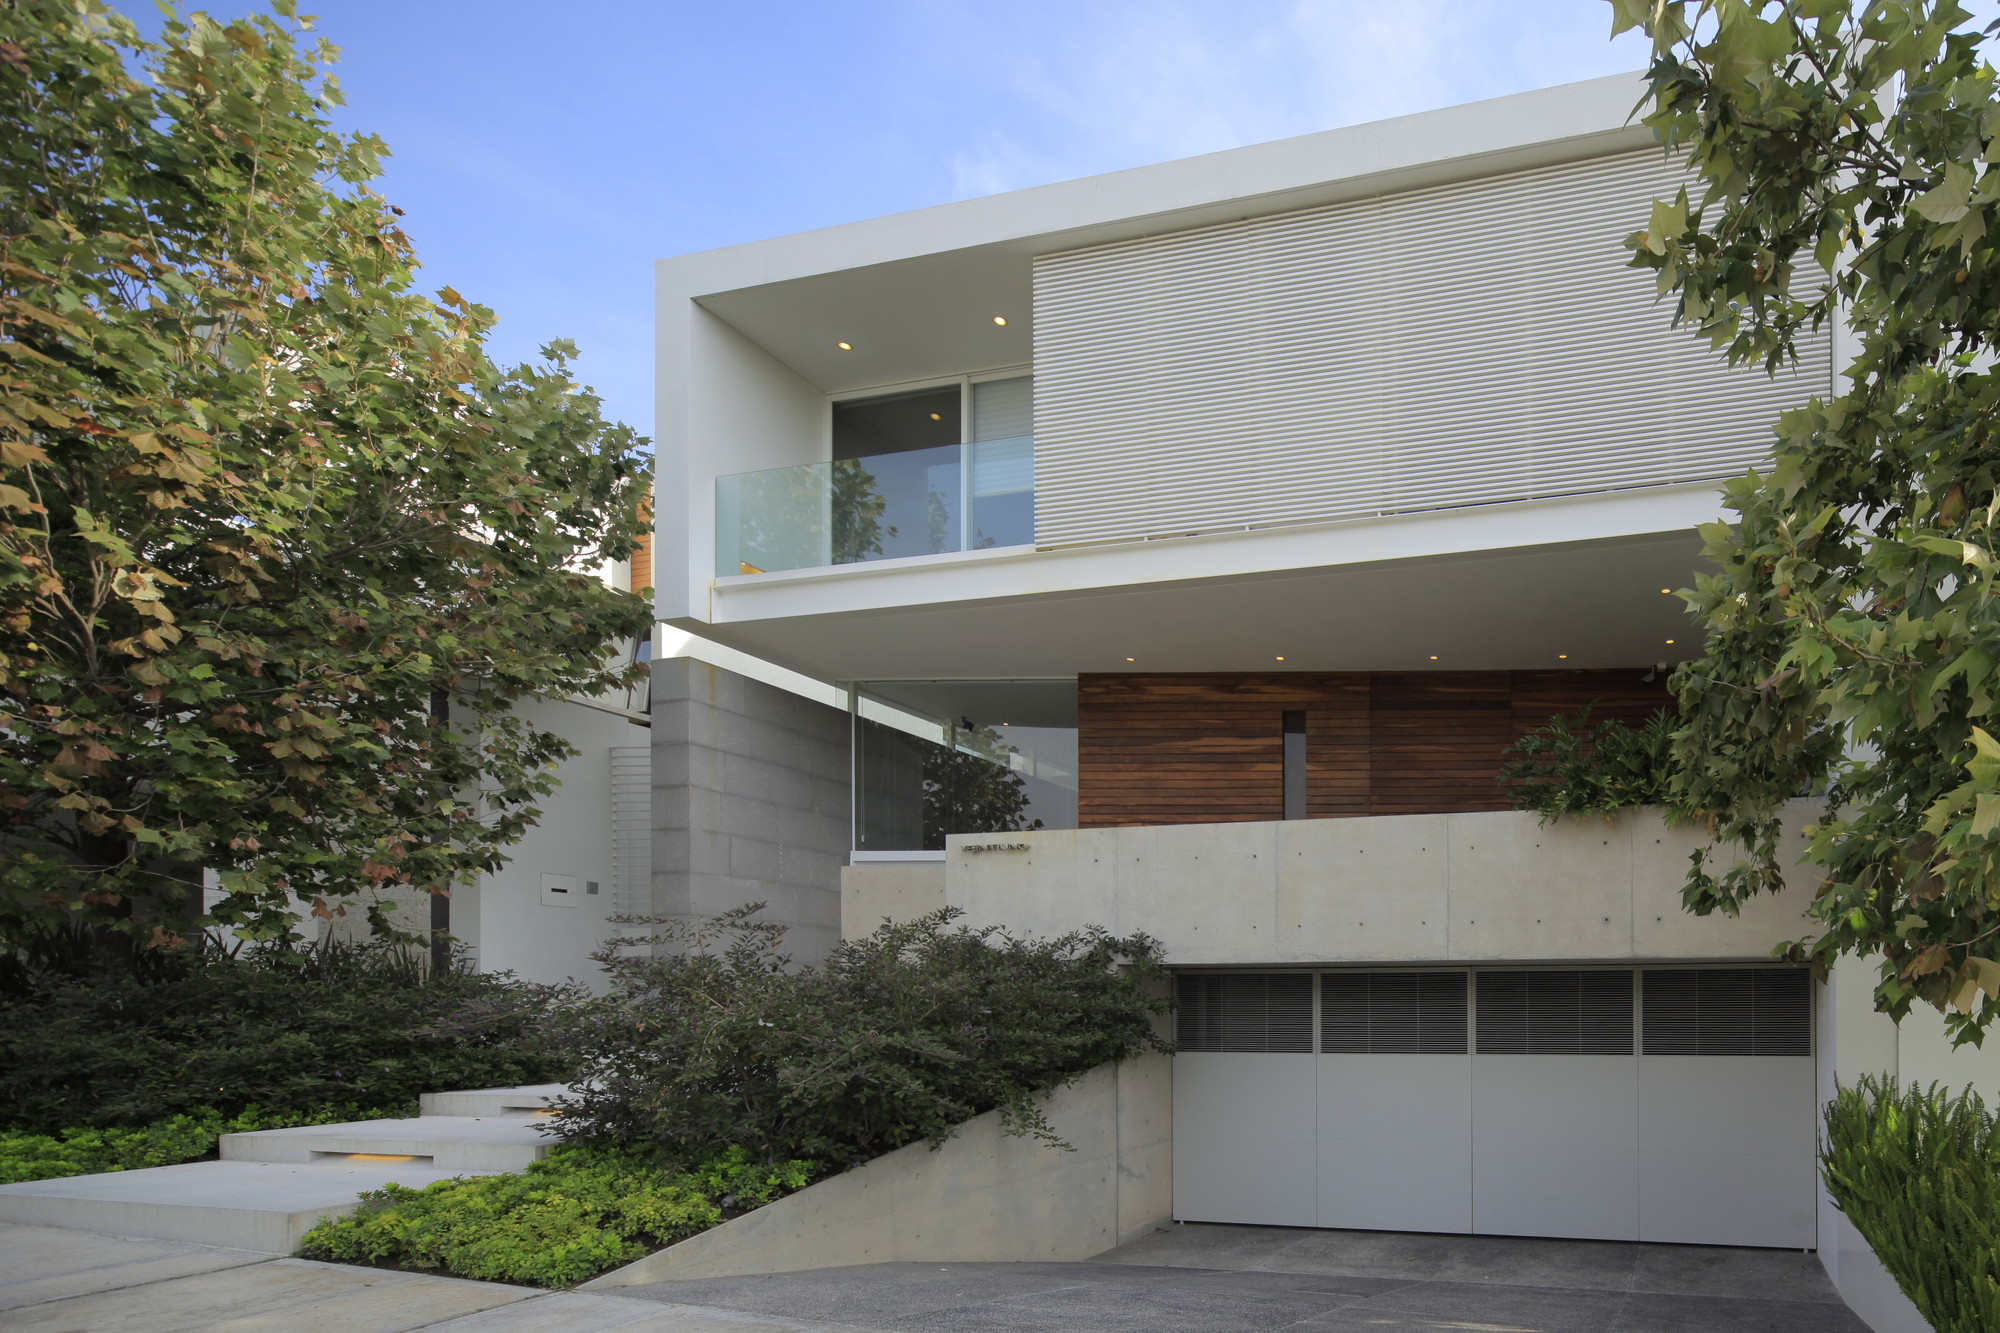 Casa veintiuno hern ndez silva arquitectos archdaily for Casas minimalistas modernas